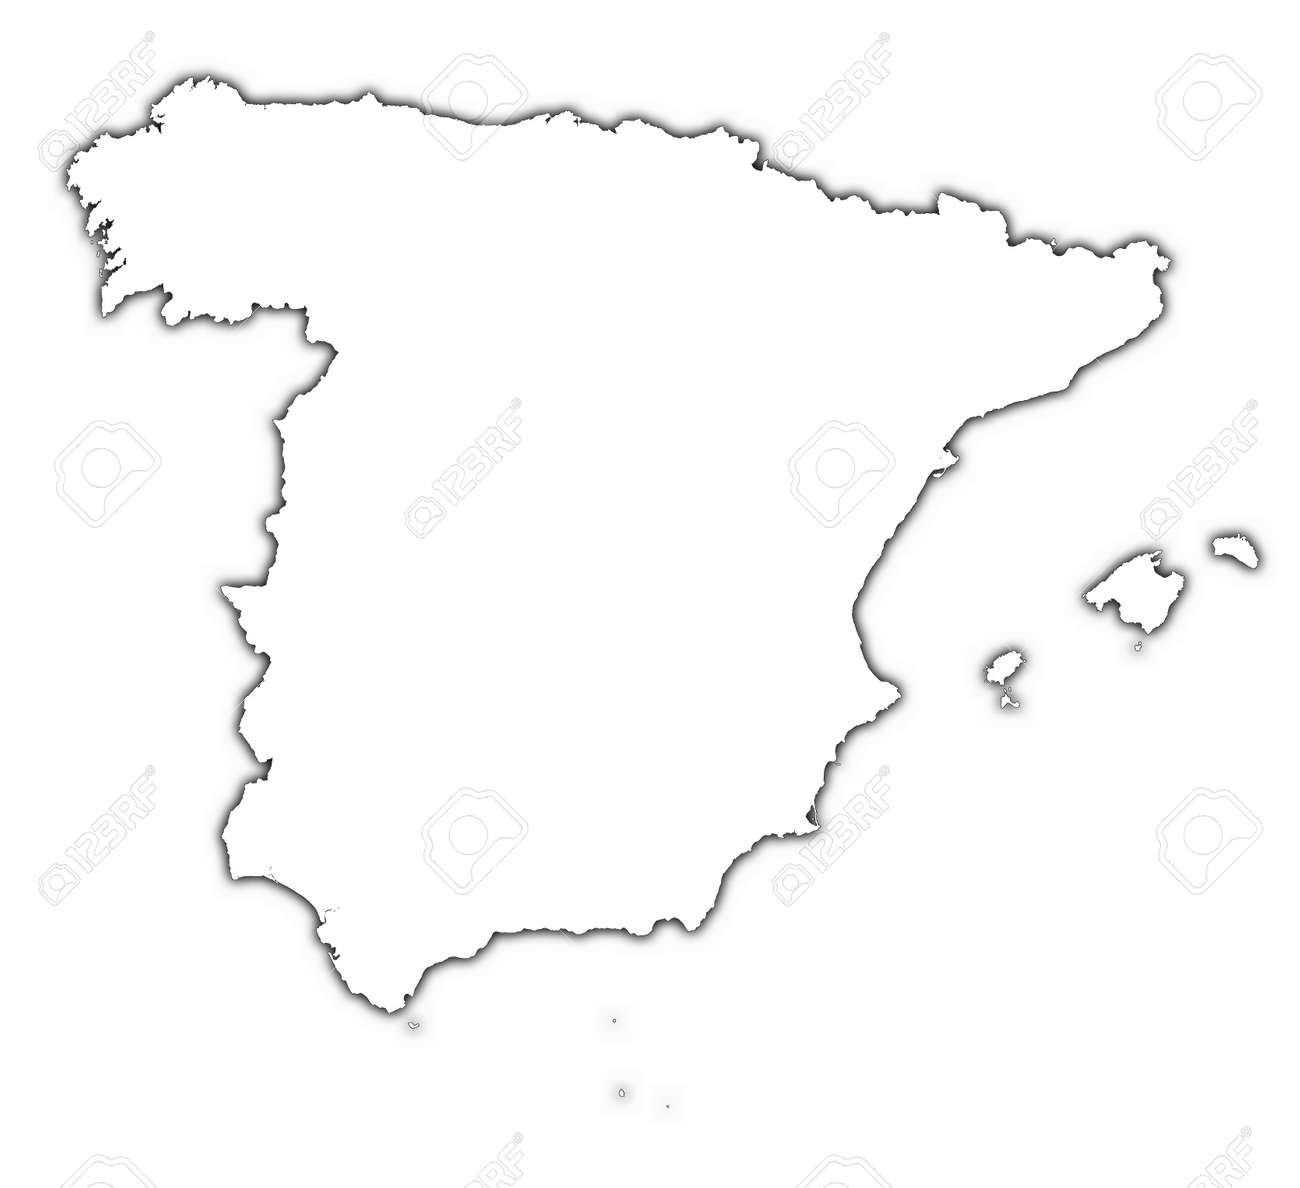 Carte Espagne Muette.Espagne Carte Muette De L Ombre Detaillee Projection De Mercator